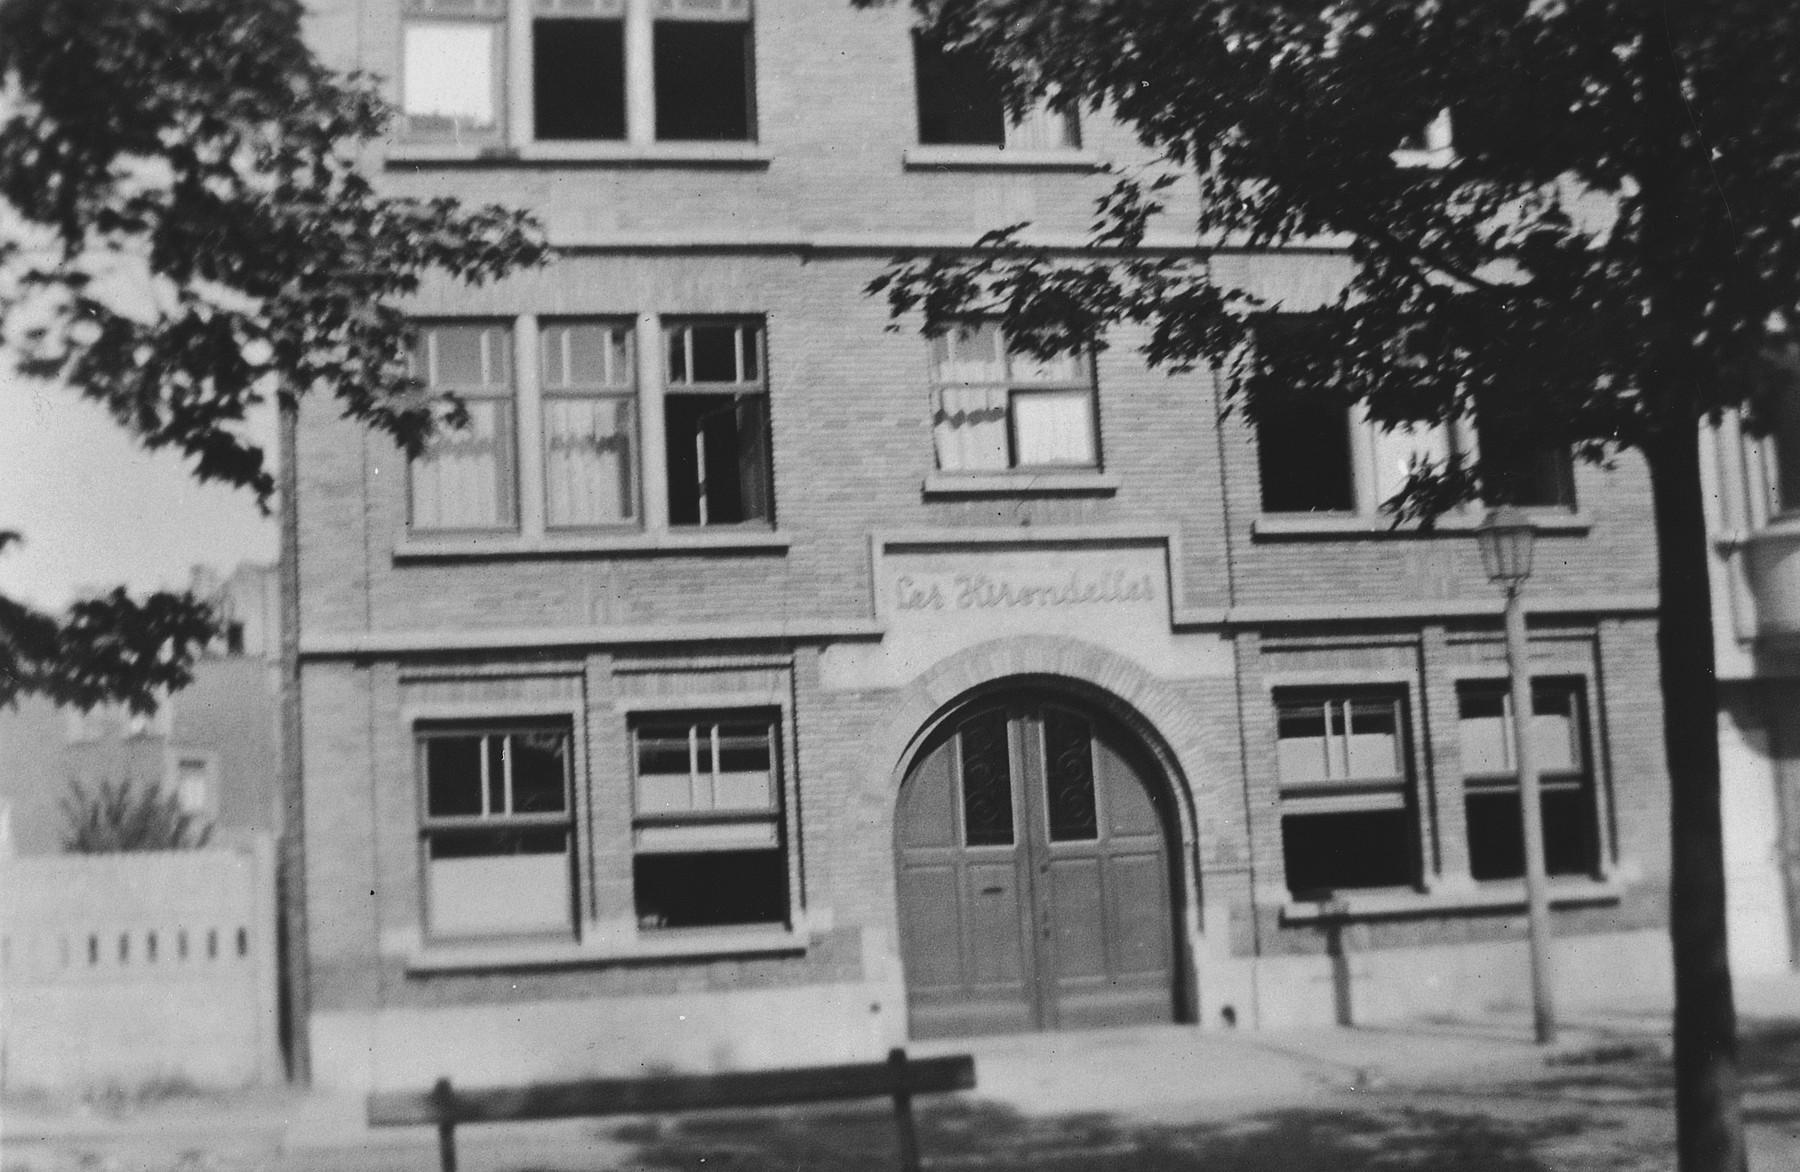 Exterior view of Le Home des Hirondelles, a Belgium children's home in Anderlecht.